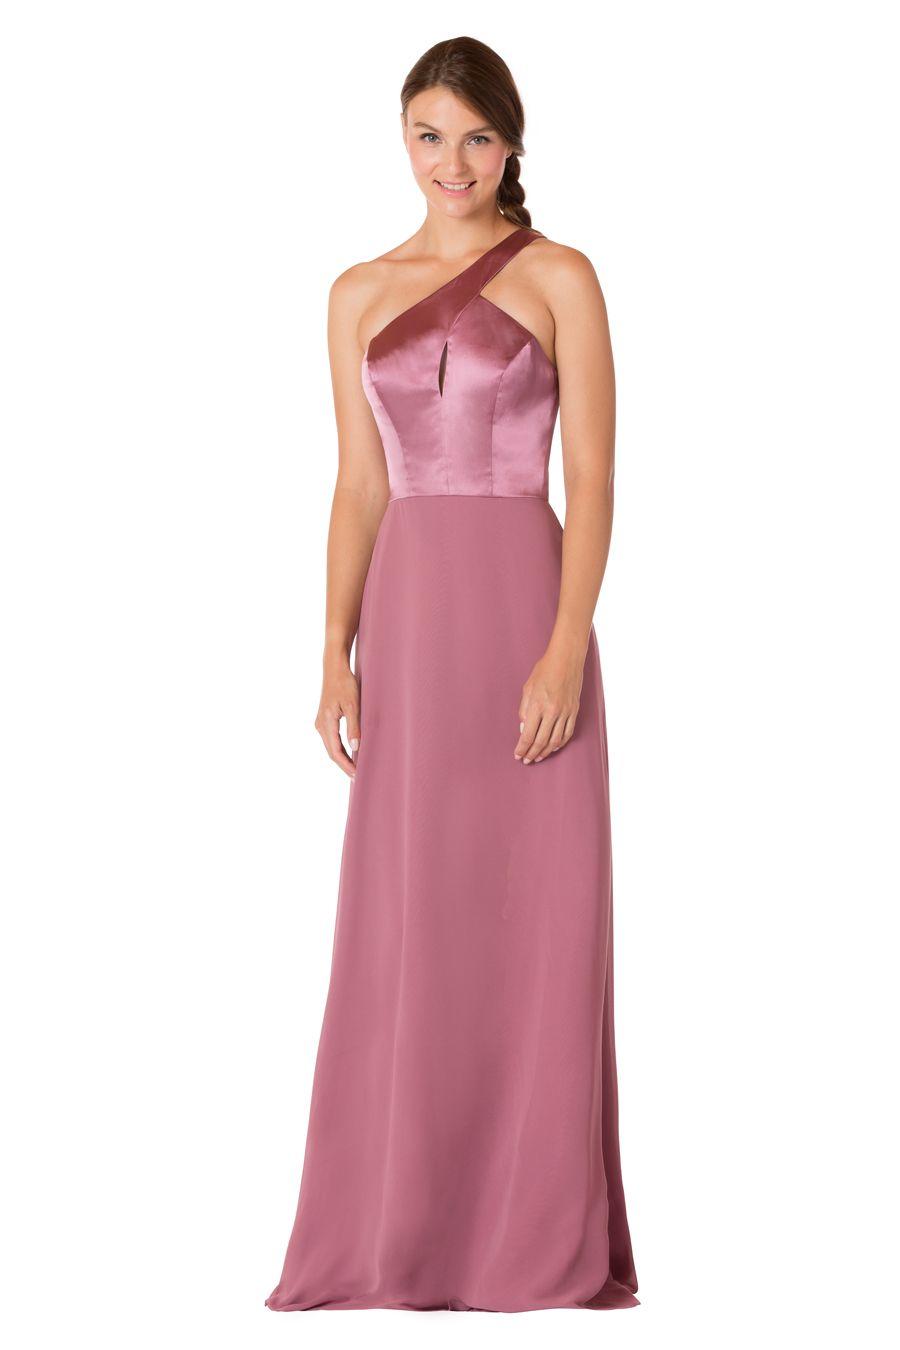 Bari Jay Bridesmaid dress | Style 1722 | Spring 2017 | Swing into ...